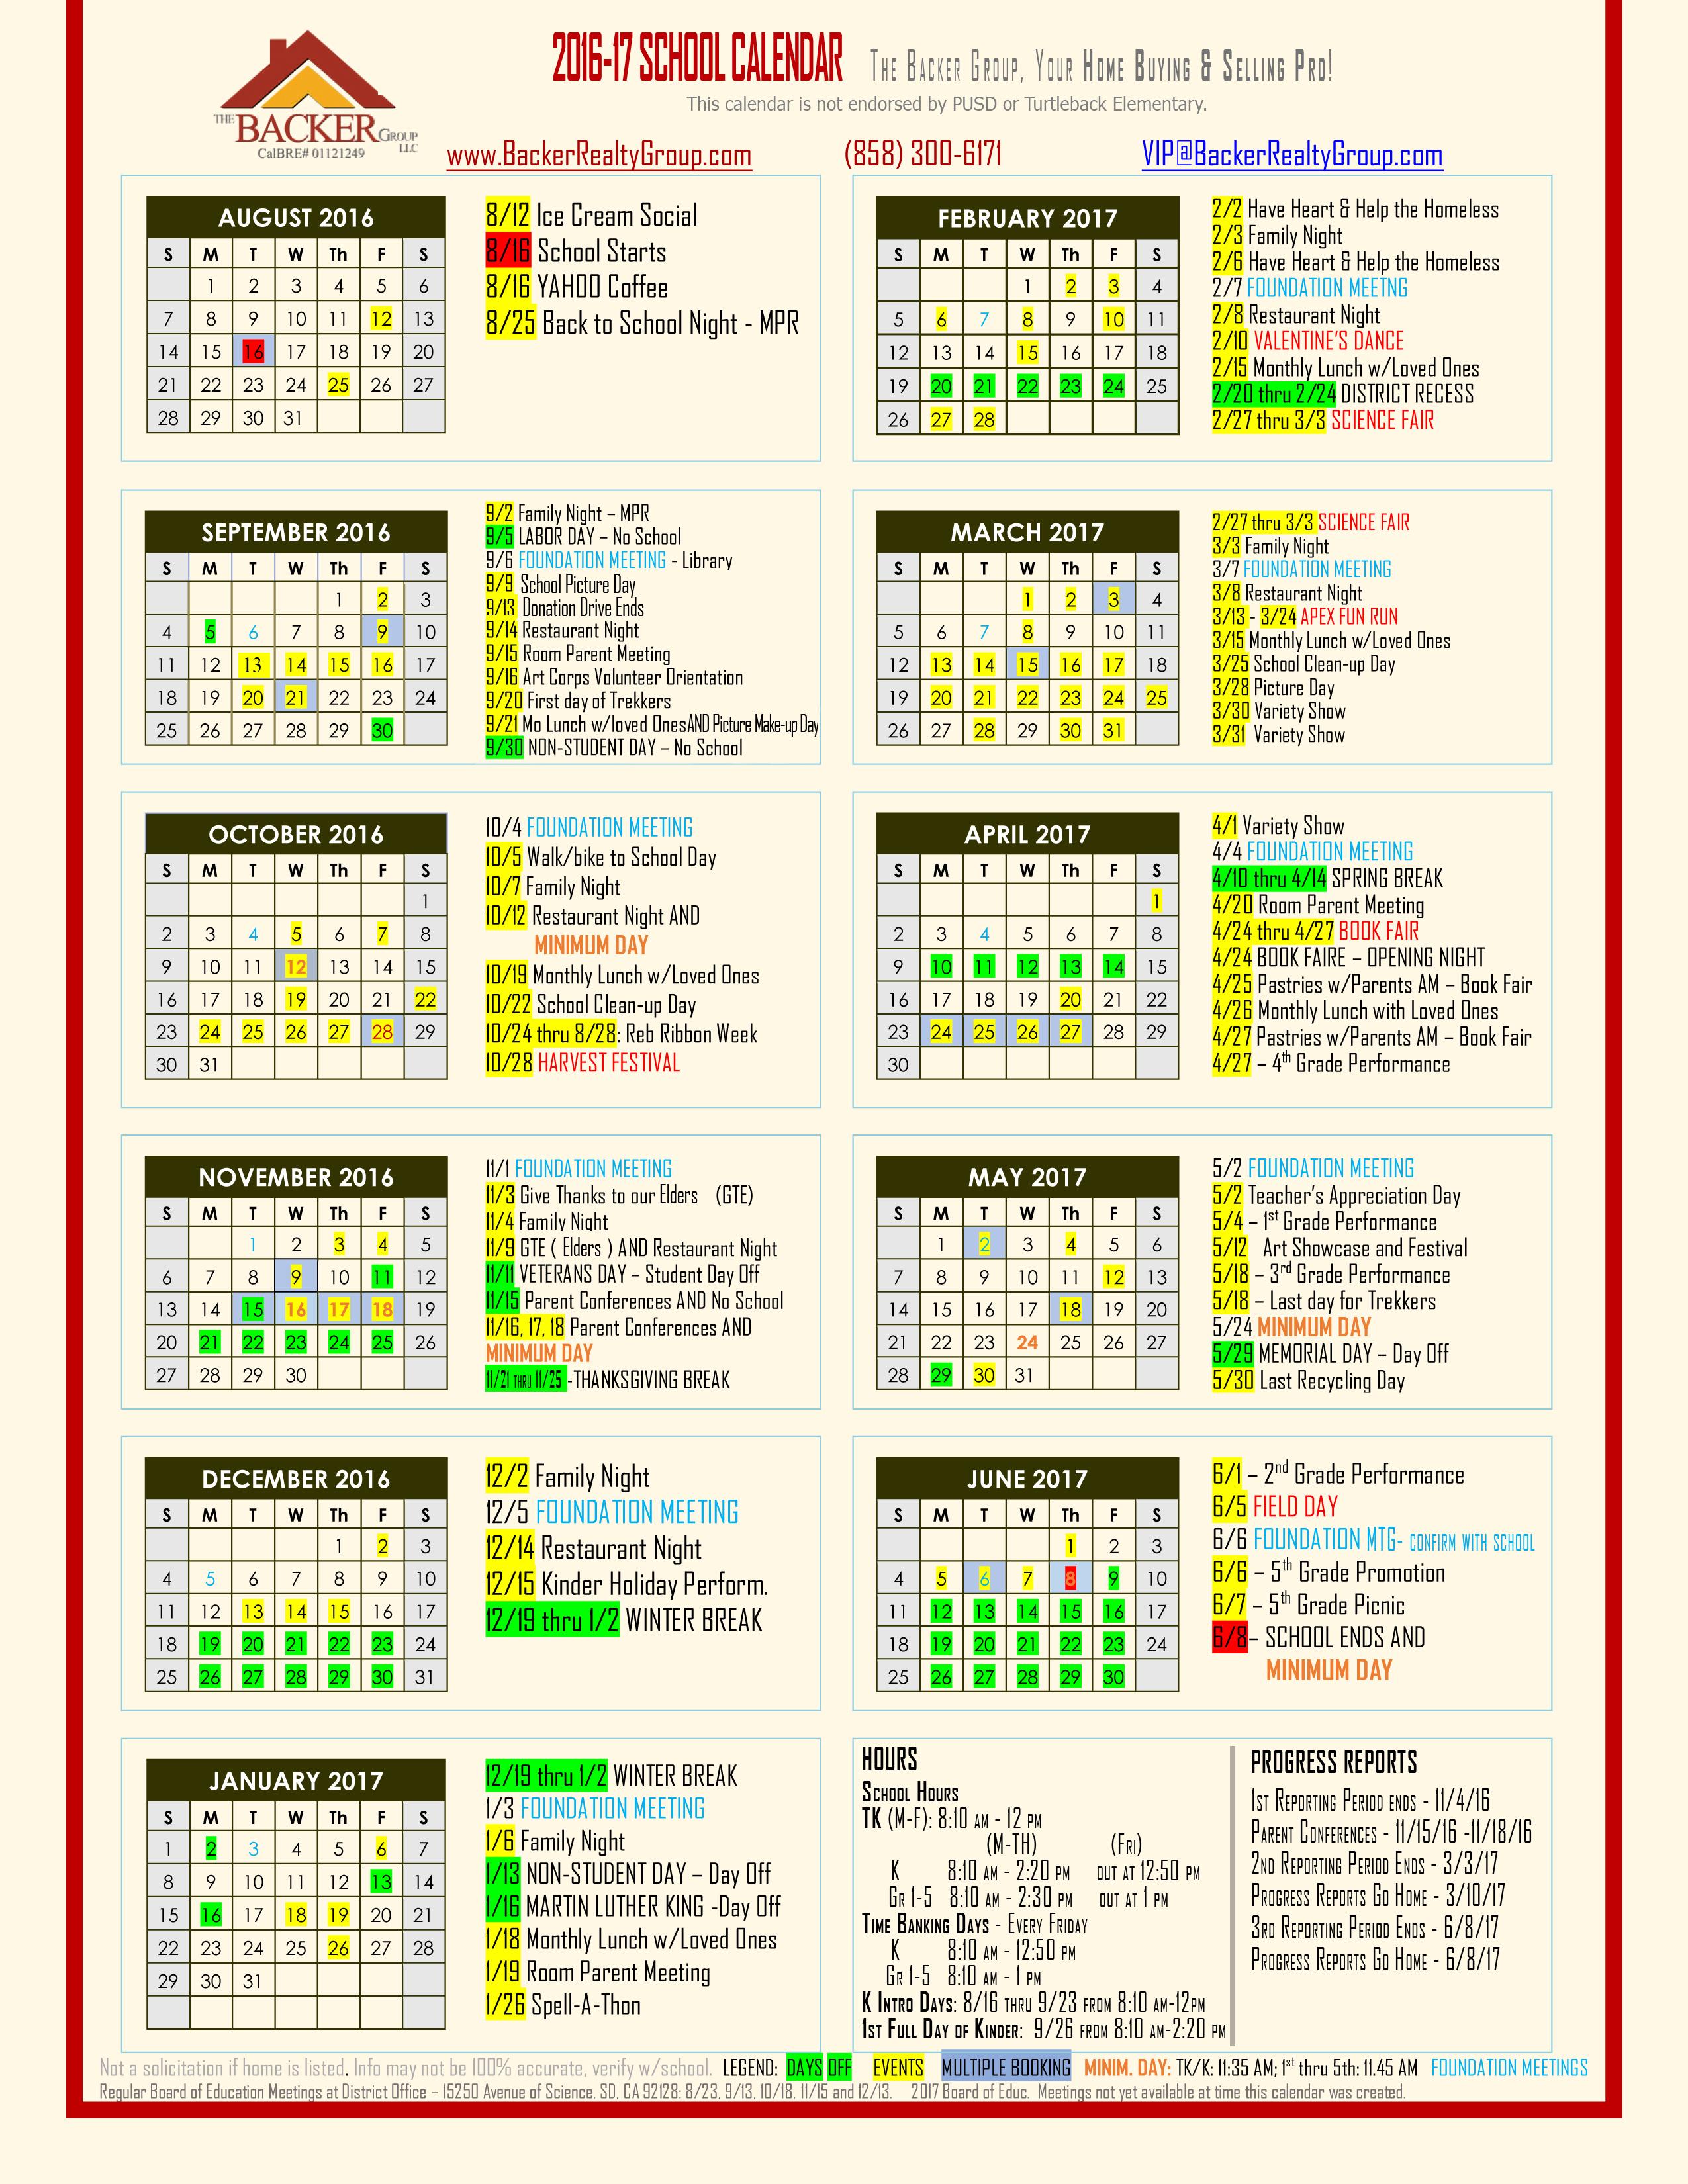 Turtleback Elementary, Poway Unified School District, Pusd Regarding San Diego Unified School District Calendar